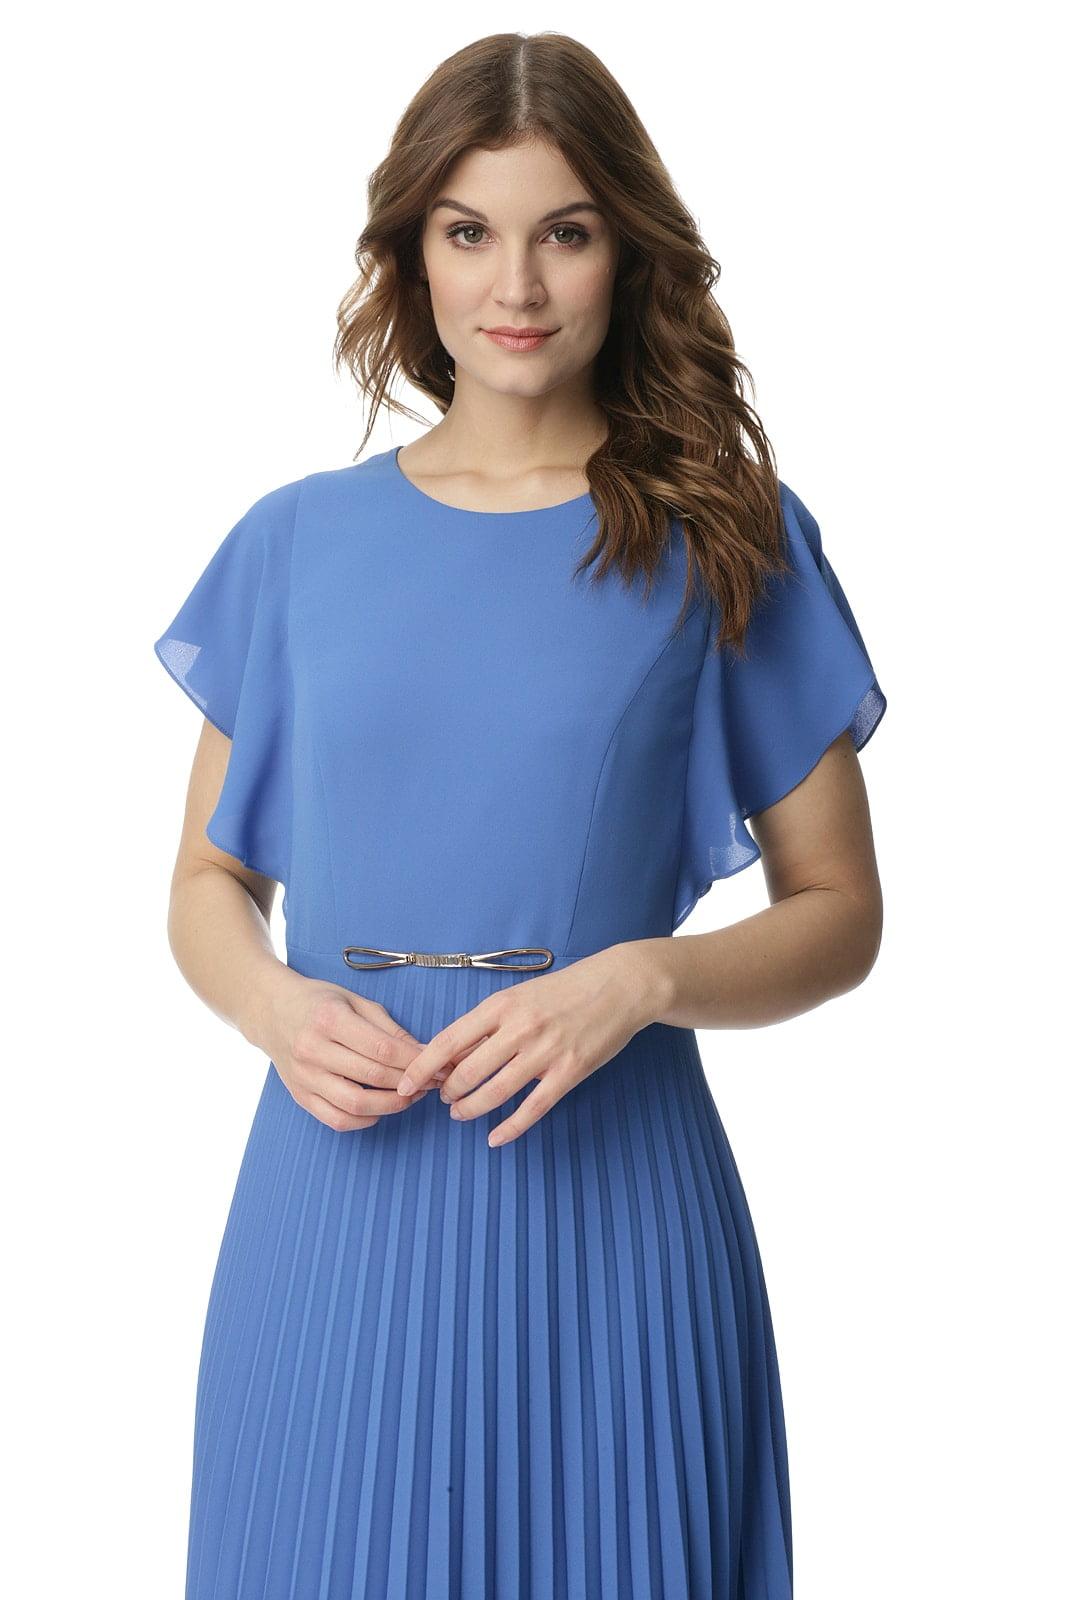 d591ba20b1 Niebieska sukienka z plisowanym dołem Mariola - Modesta - ponad 30 ...